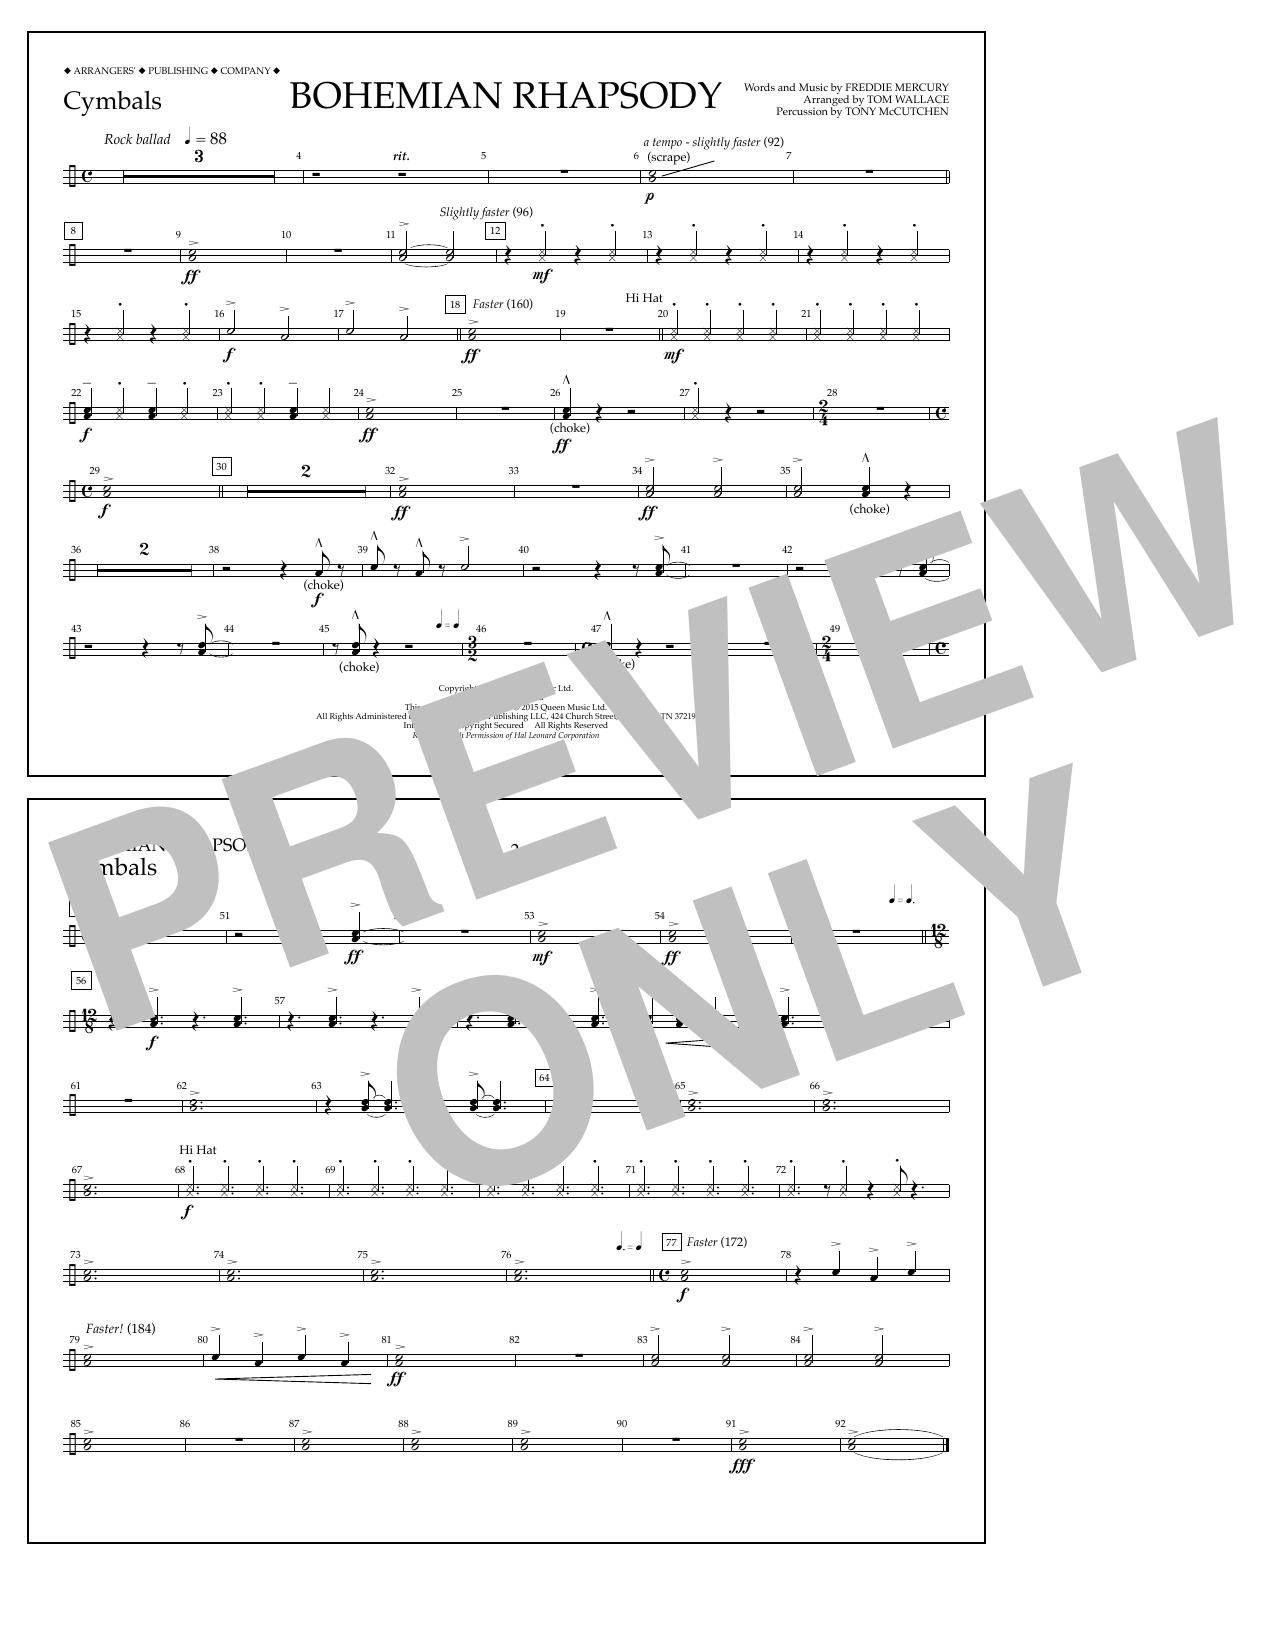 Bohemian Rhapsody - Cymbals (Marching Band)